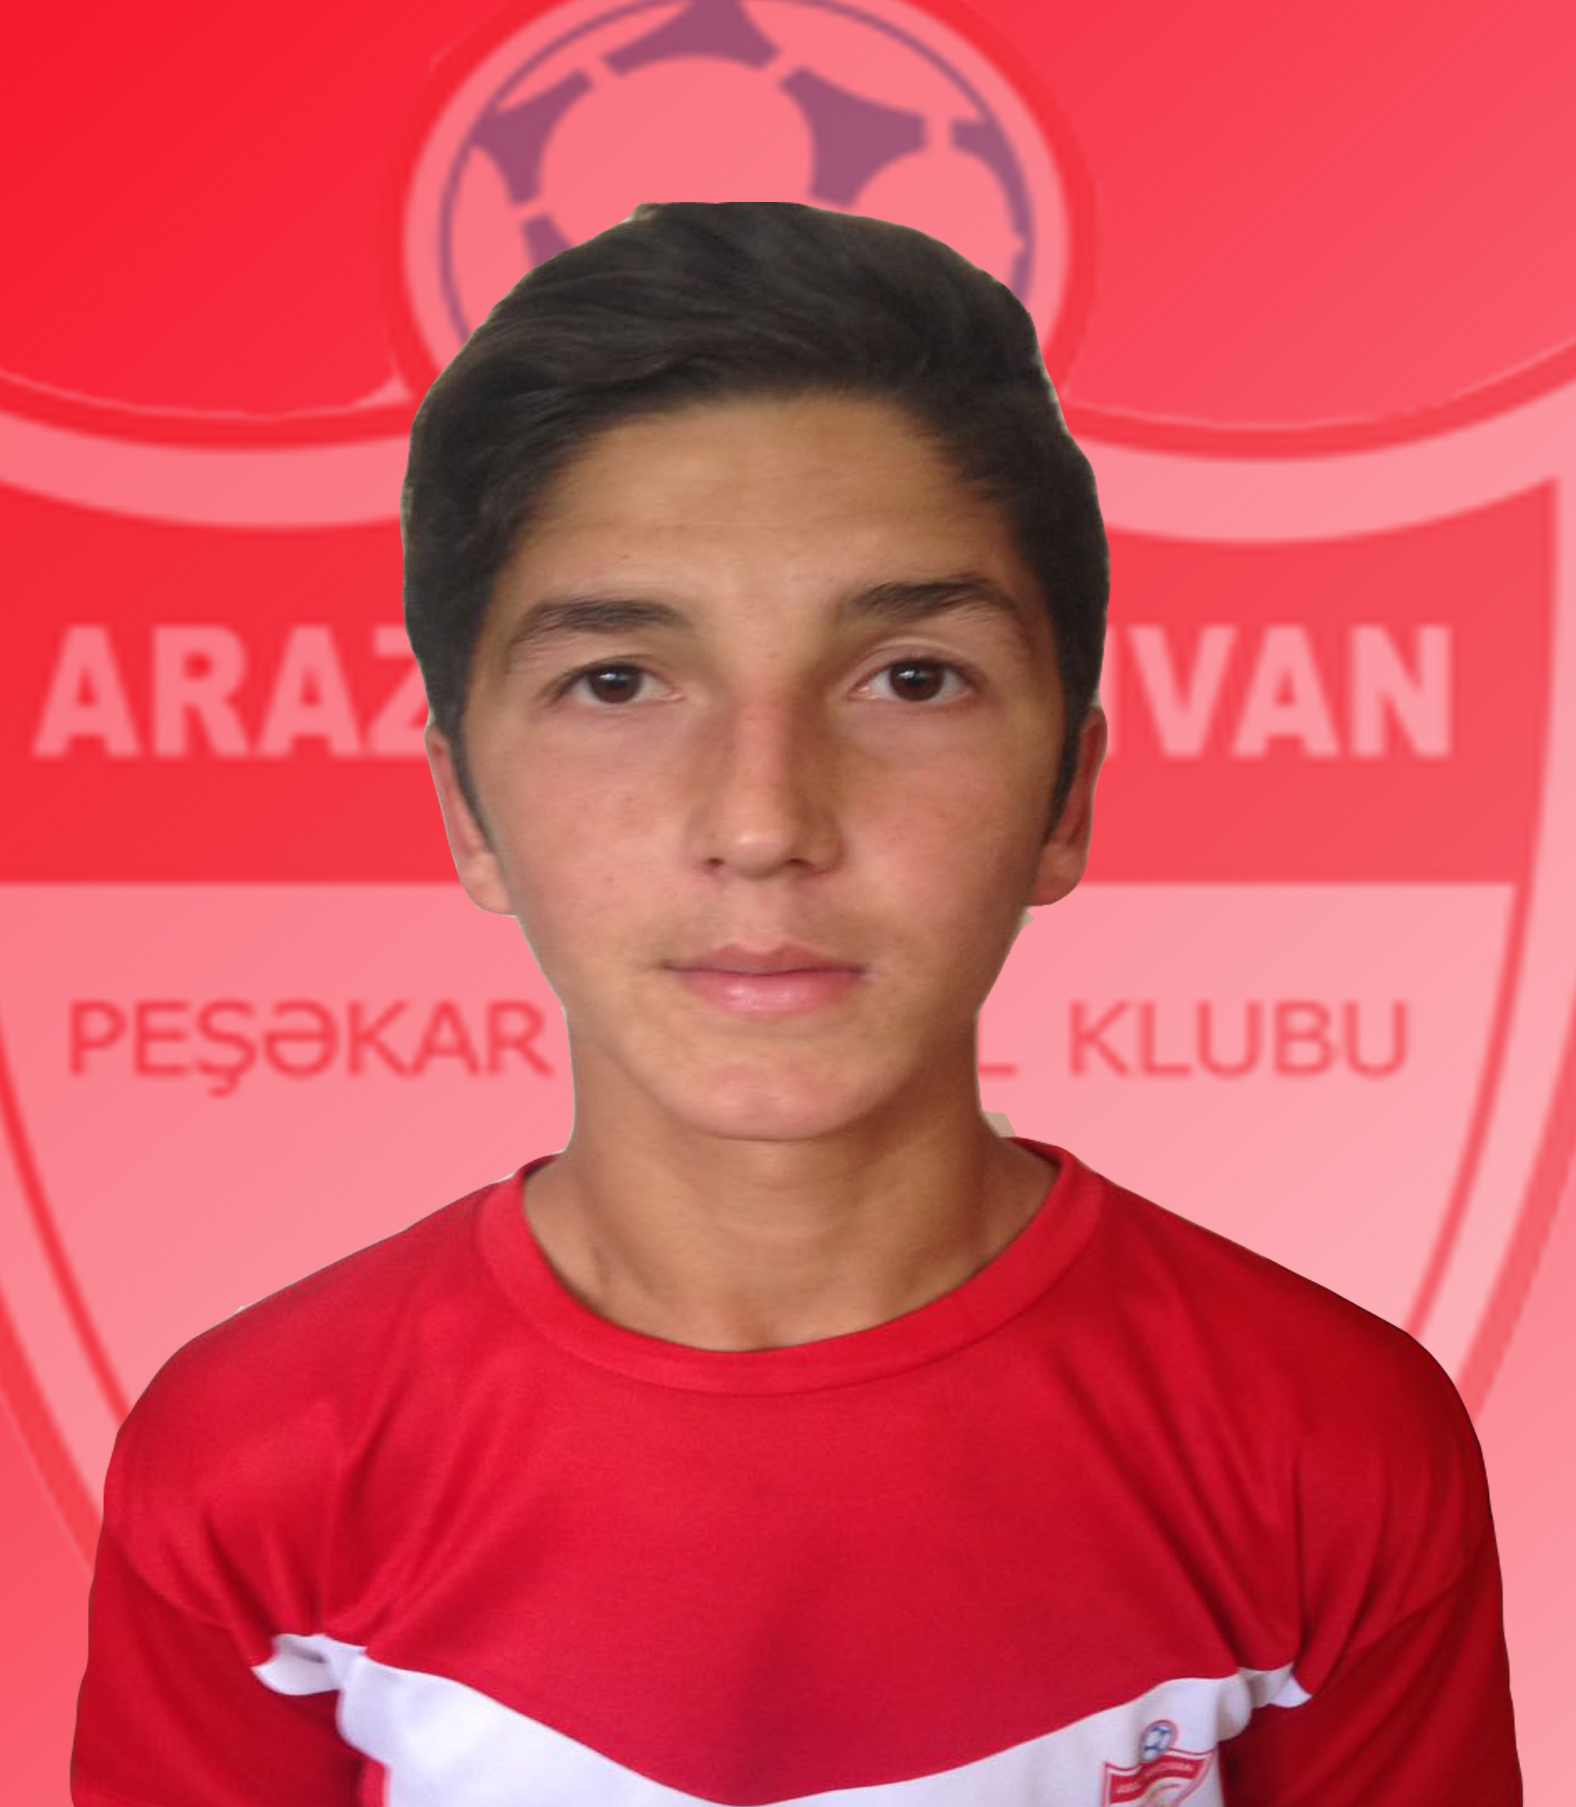 Tayfur Quliyev